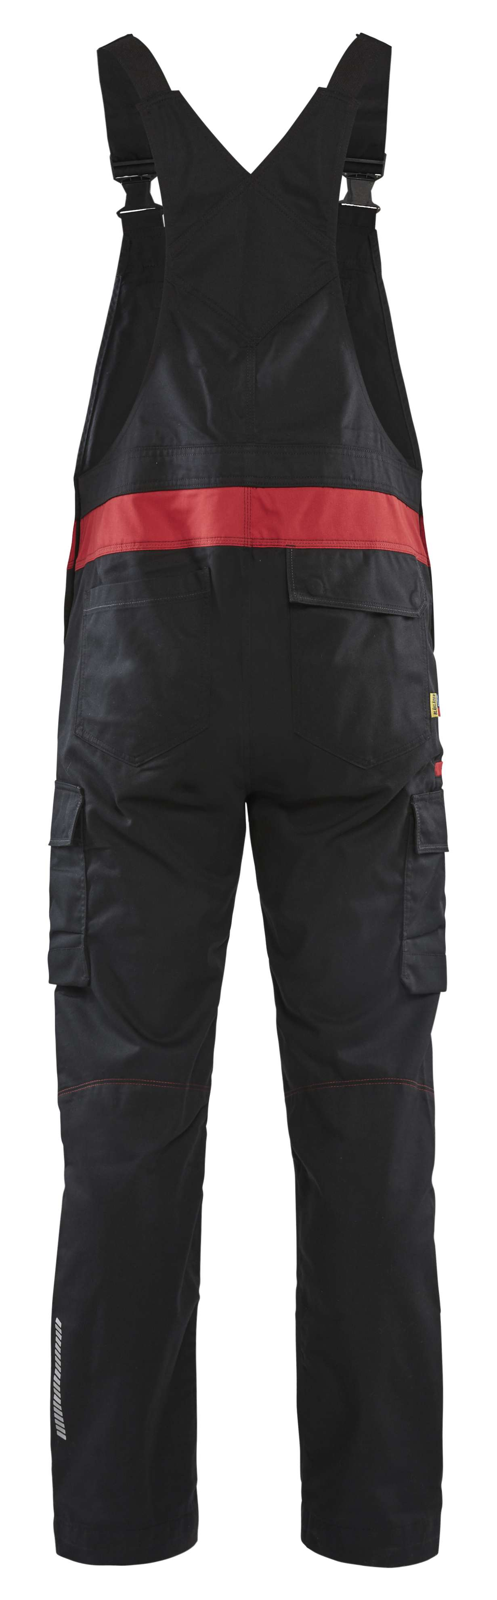 Blaklader Am. Overalls 26441832 zwart-rood(9956)